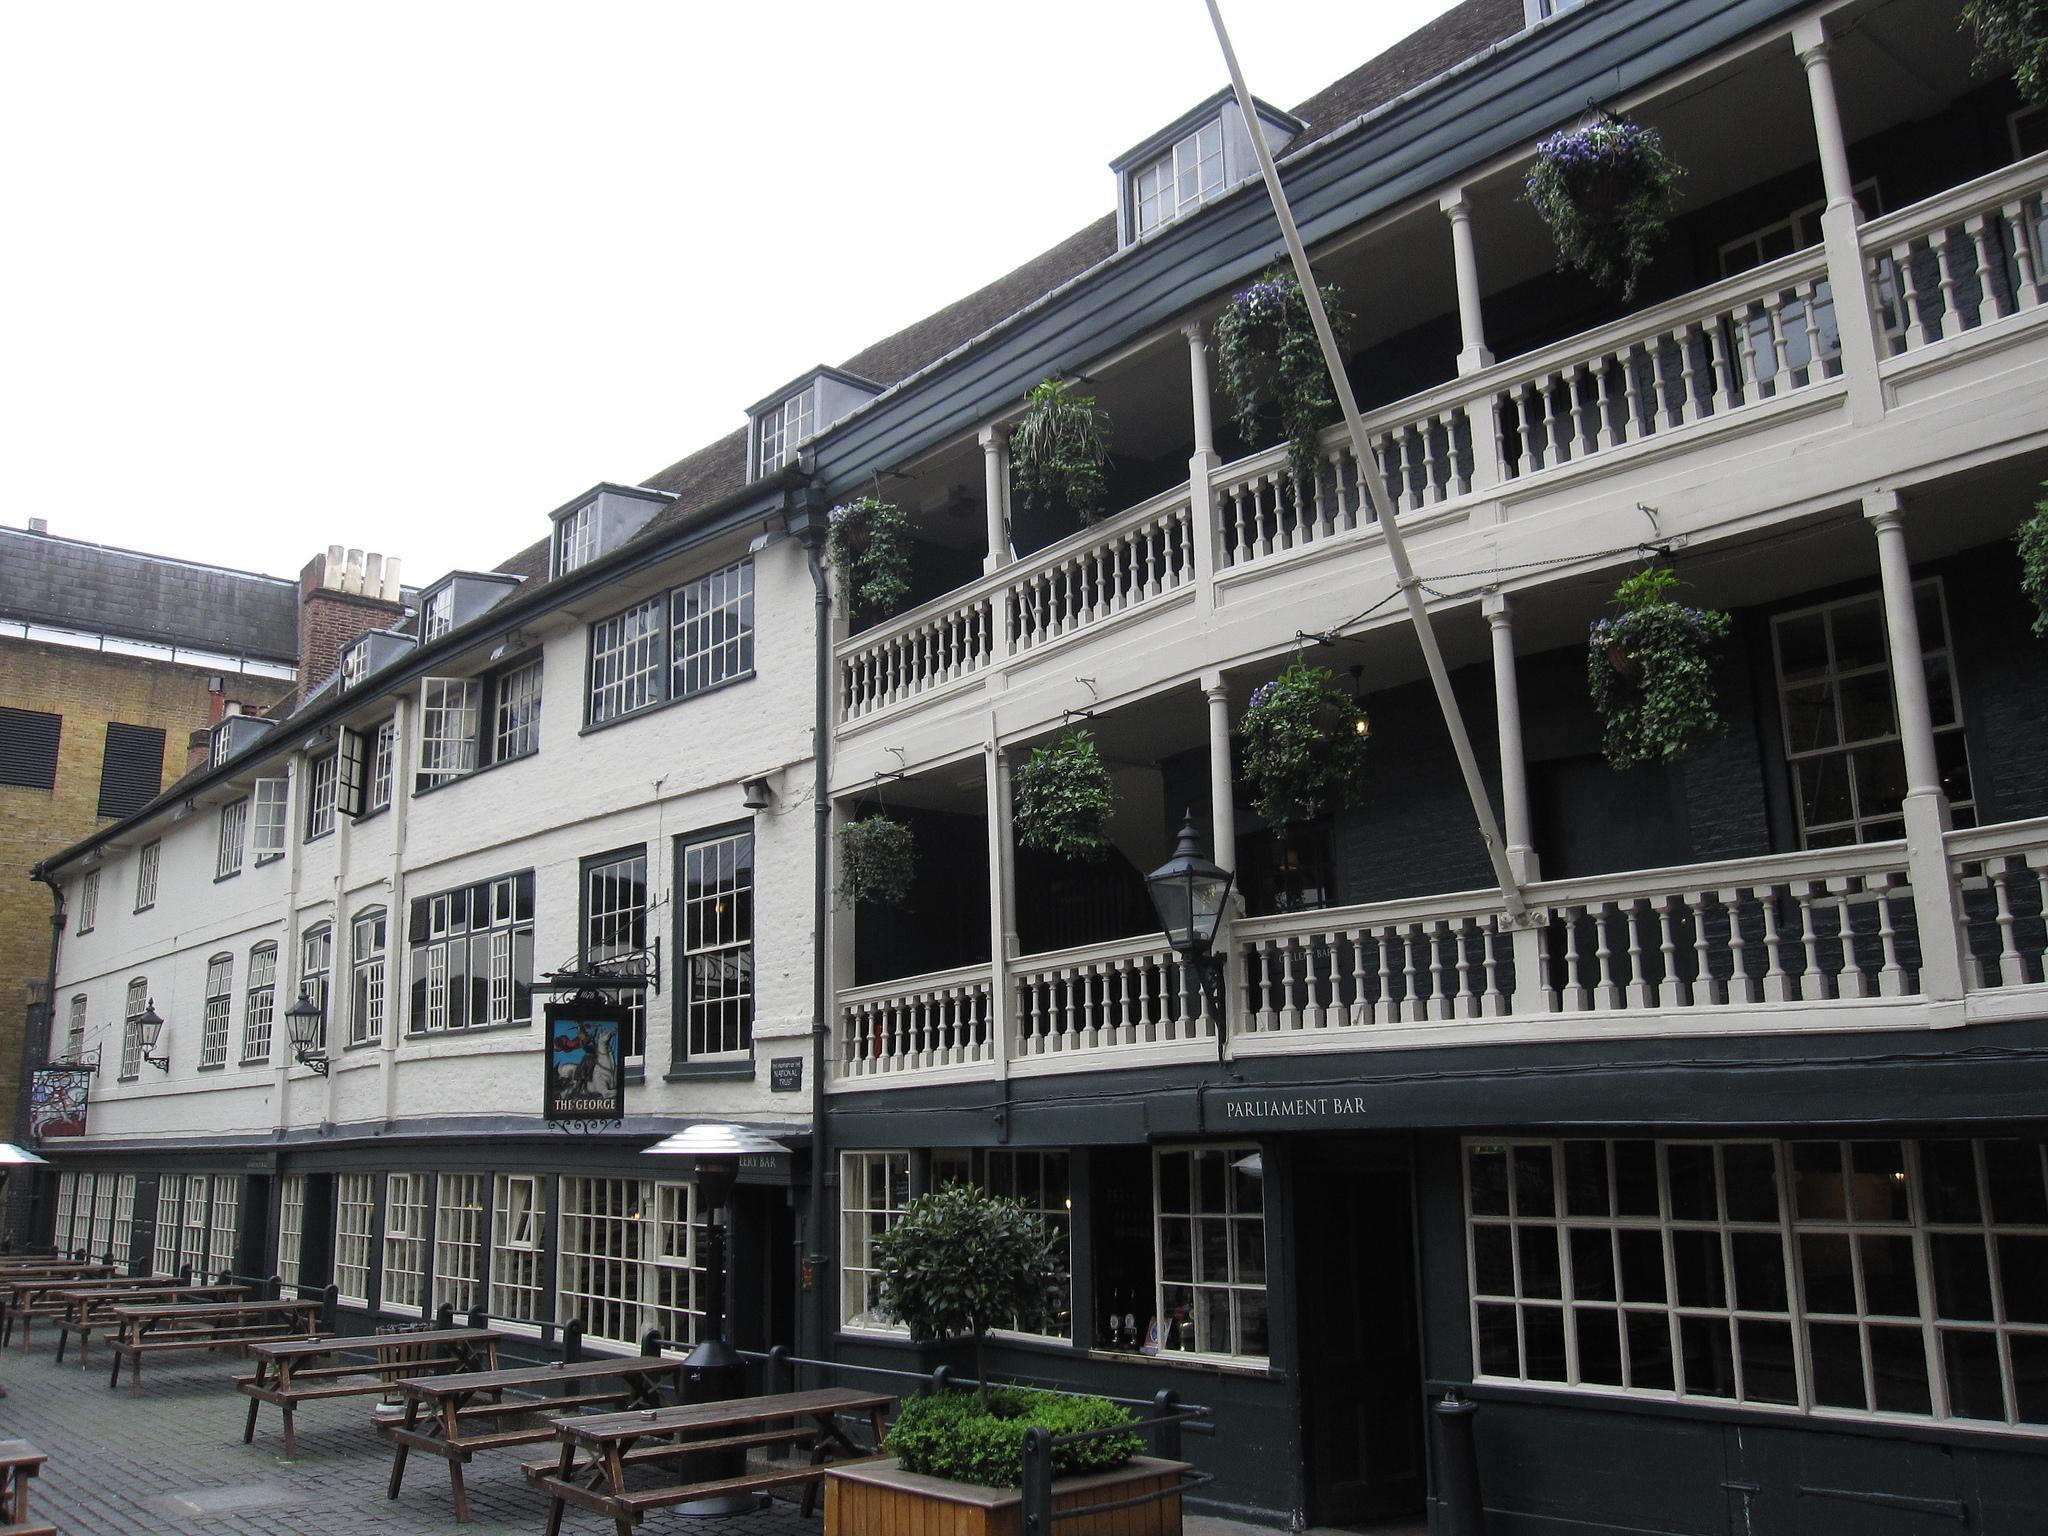 The George Inn, Flickr, © Bernt Rostad